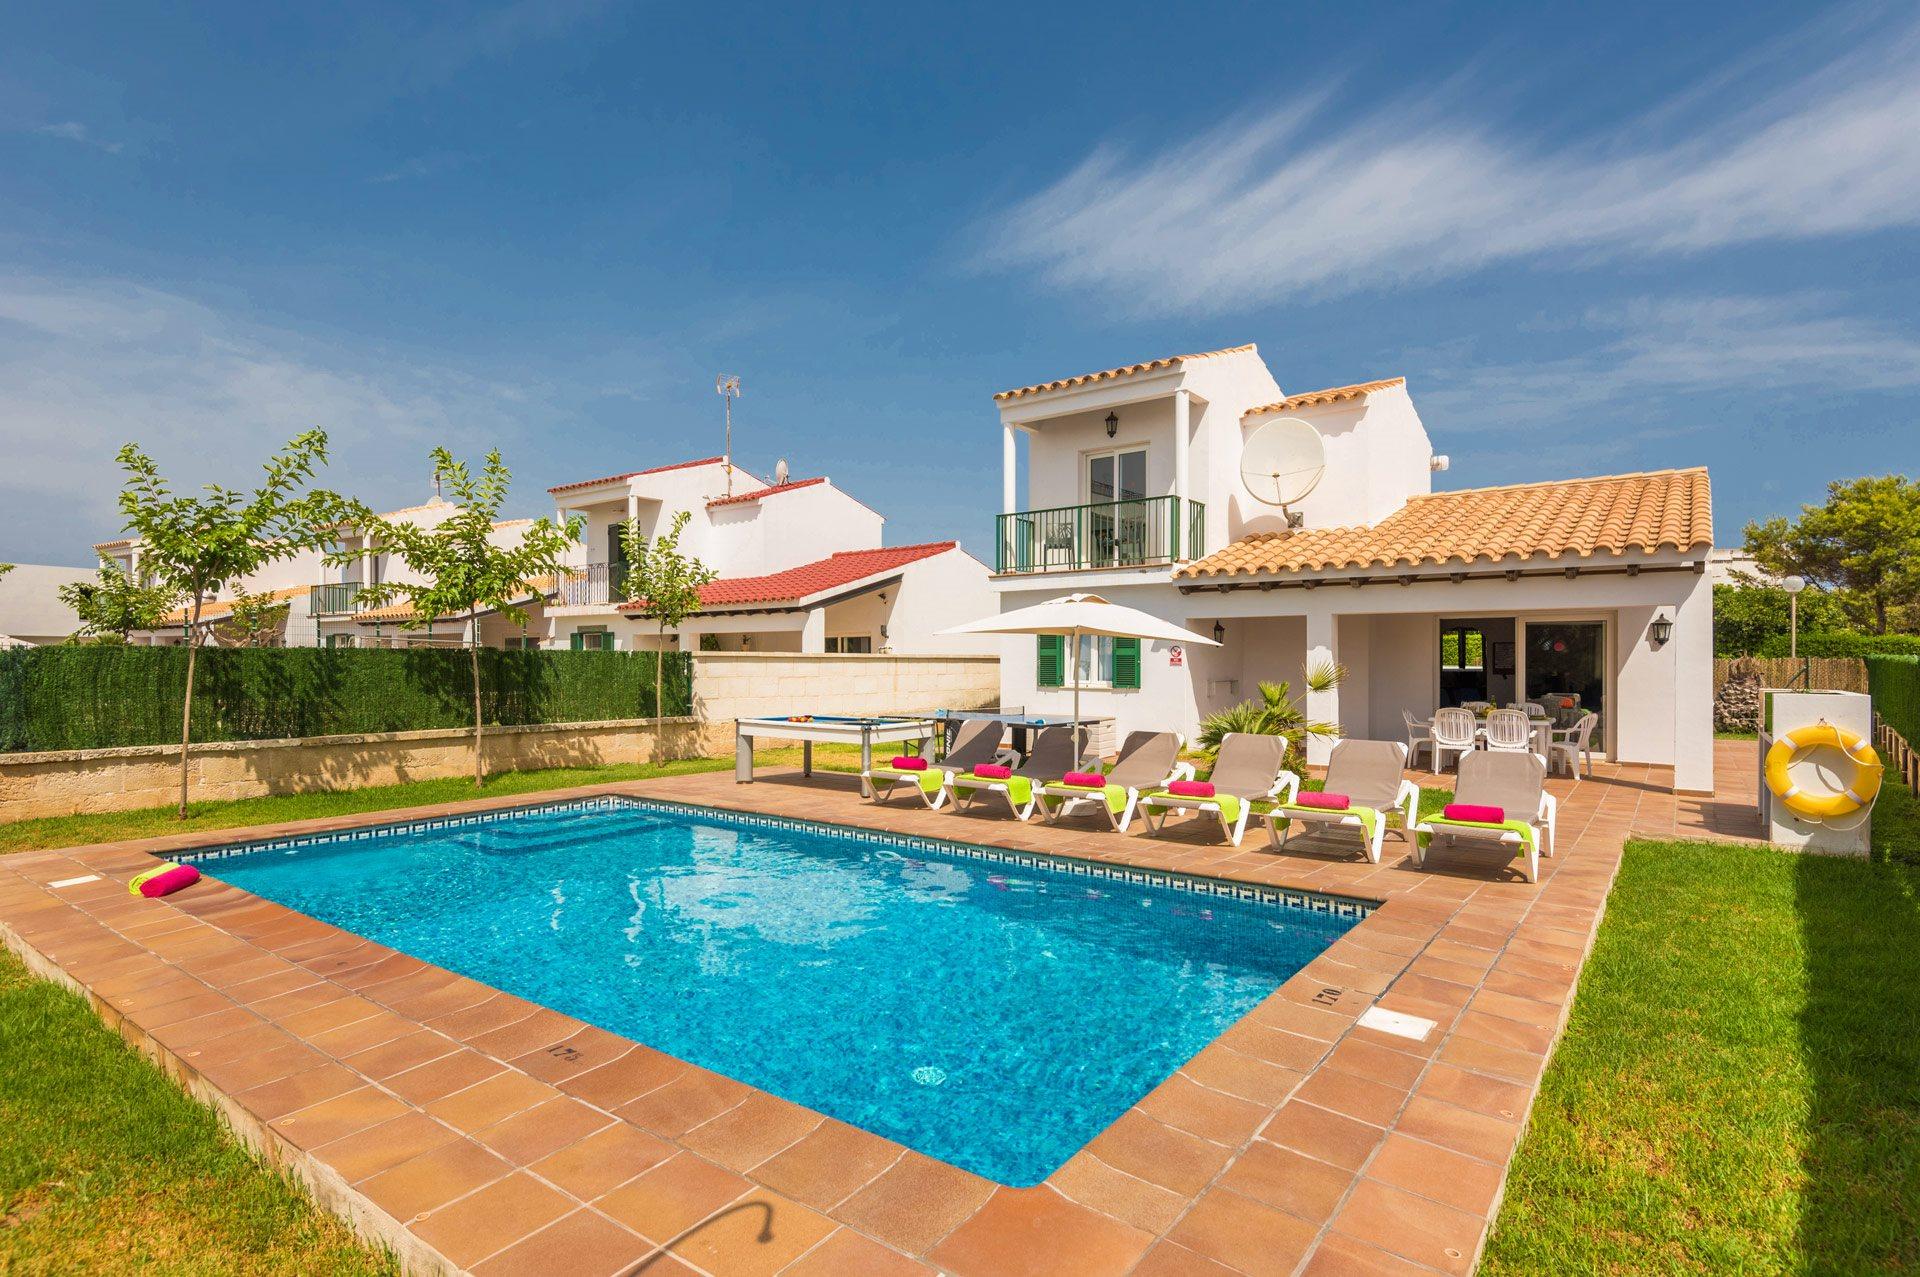 Villa Tierrasol, Calan Forcat, Menorca, Spain